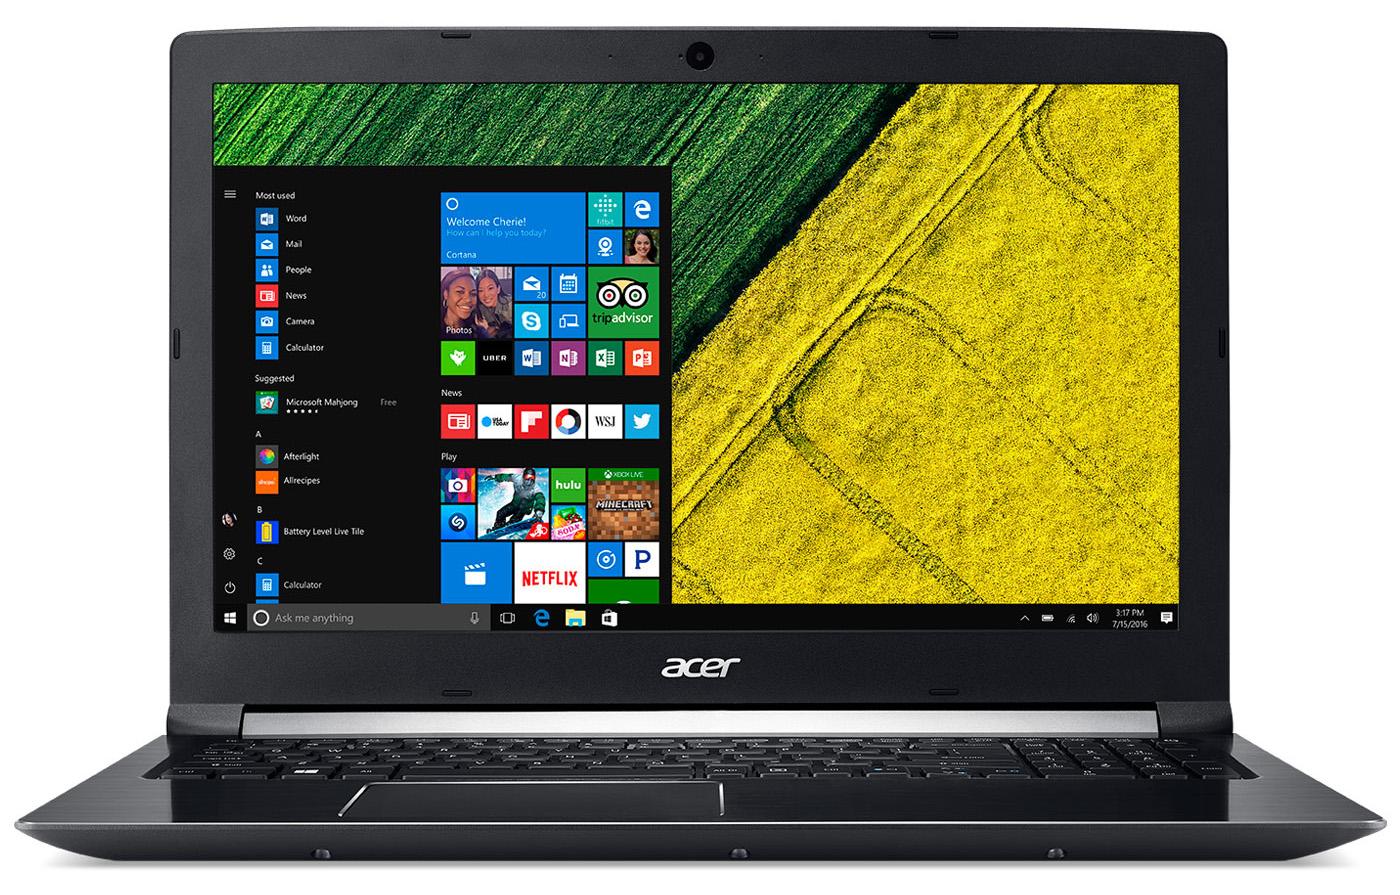 Acer Extensa 5410 Notebook Bison Camera Driver for Windows